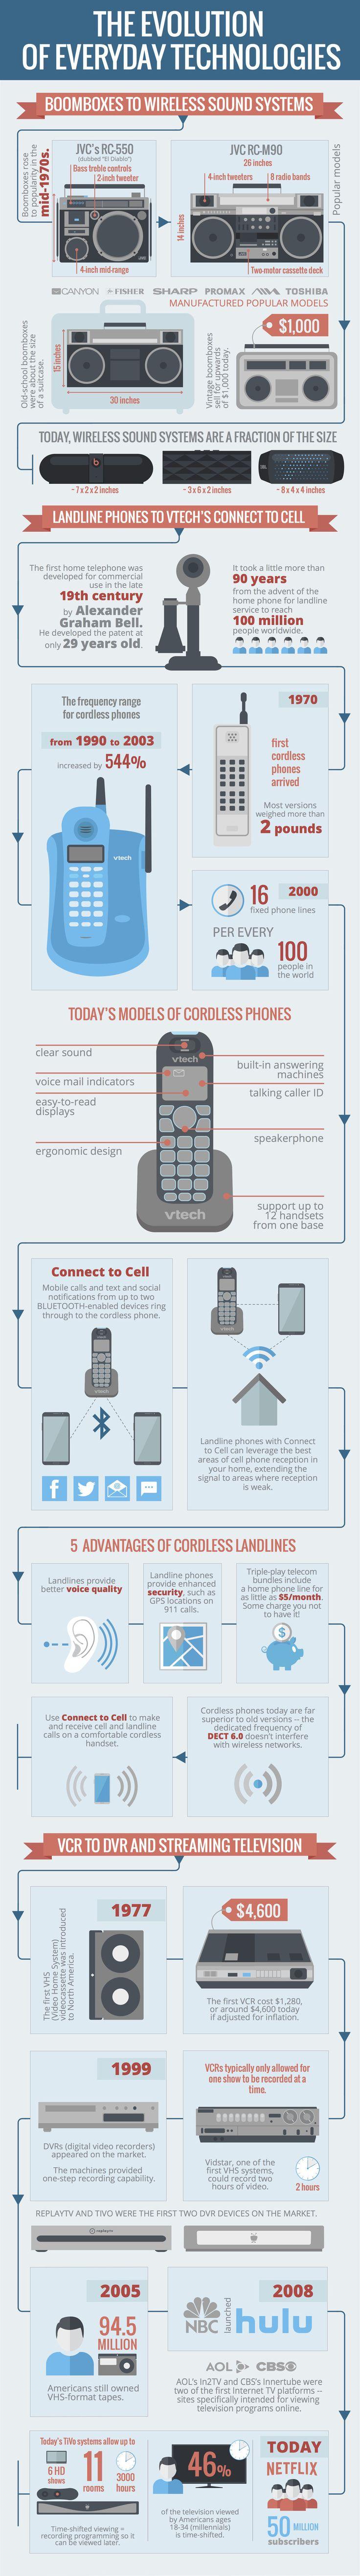 best gadgets and tech images on pinterest tech gadgets